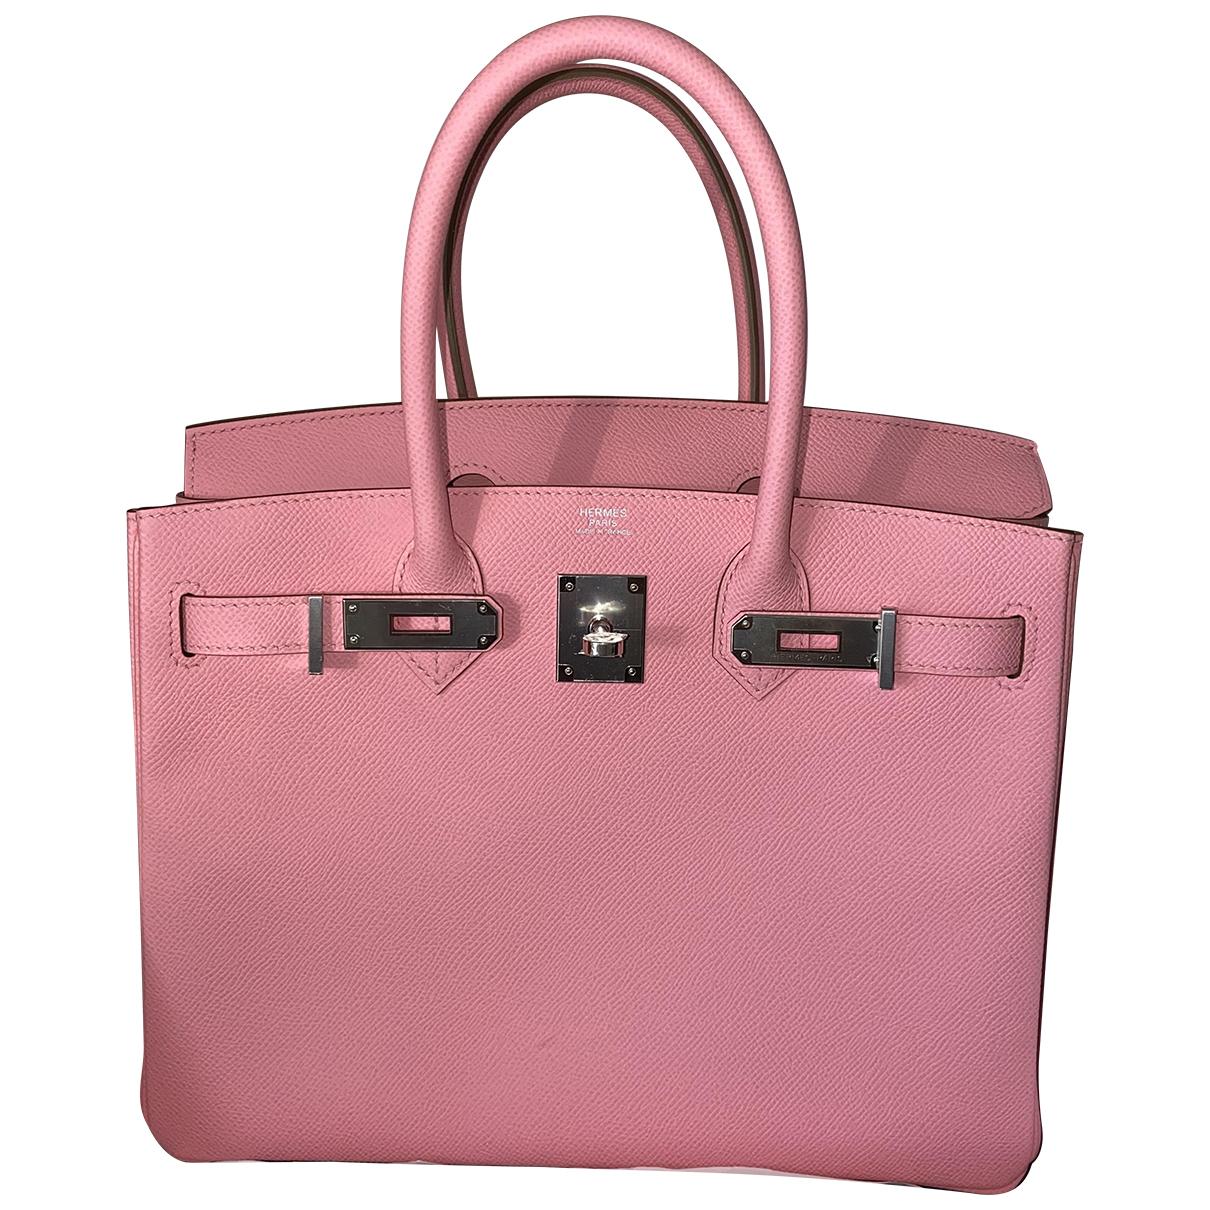 Hermès Birkin 30 Pink Leather handbag for Women N